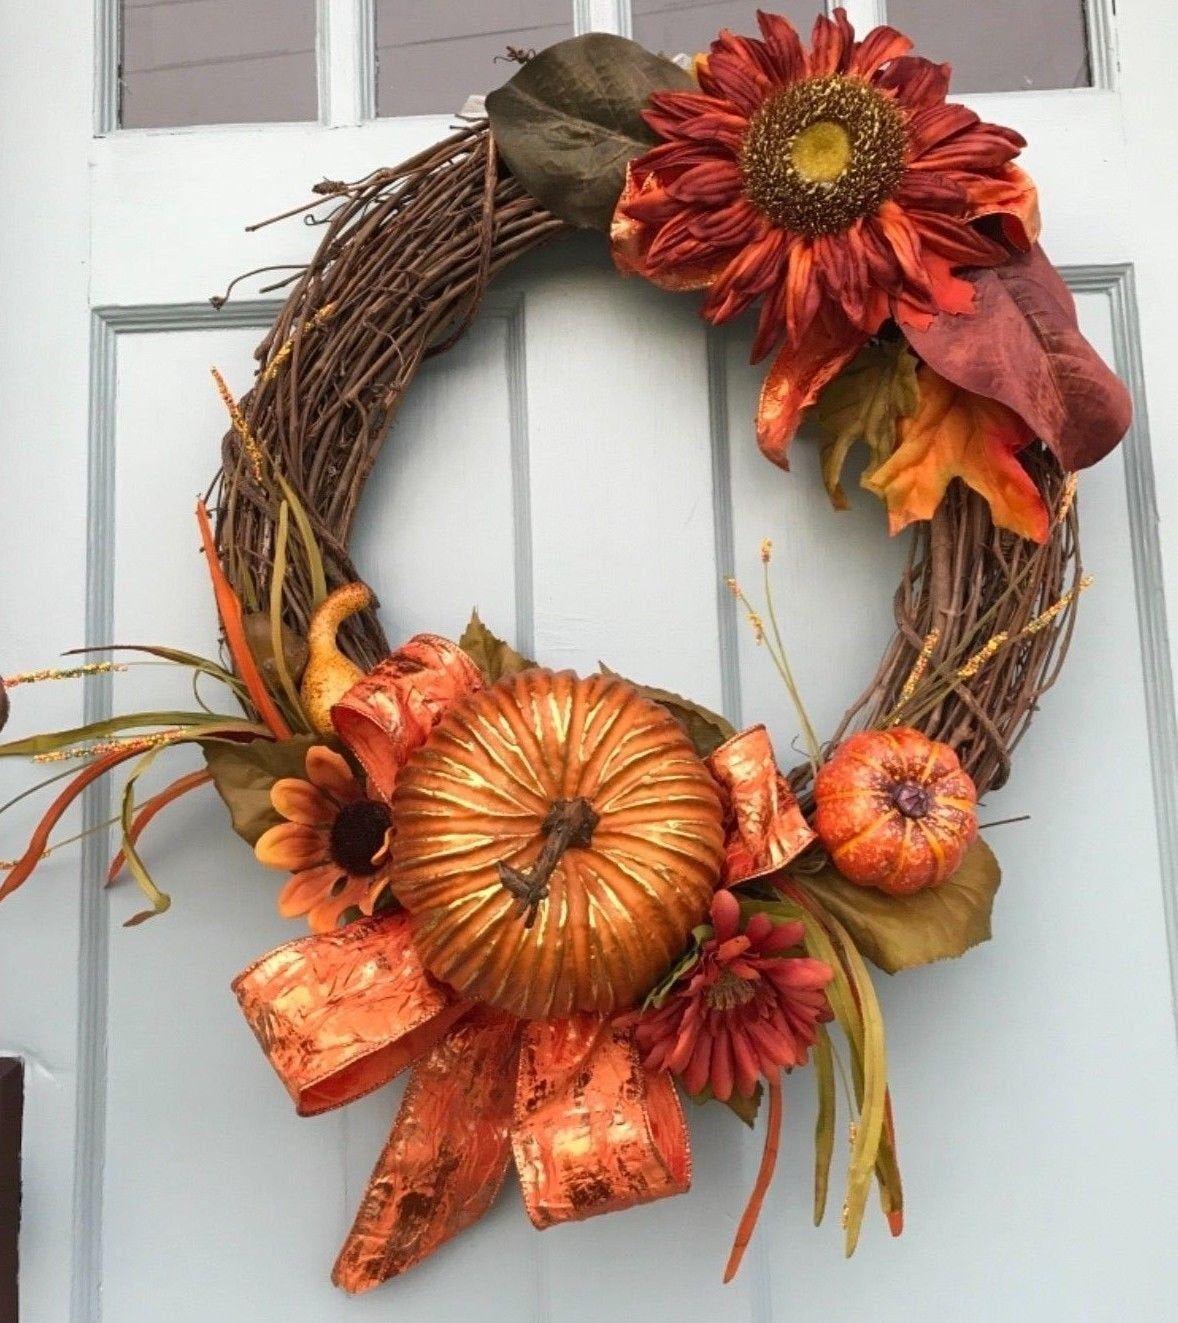 farmhouse wreath Fall or Autumn Floral Grapevine Wreath for Door grapevine wreath for front door Fall Floral Wreath for front door